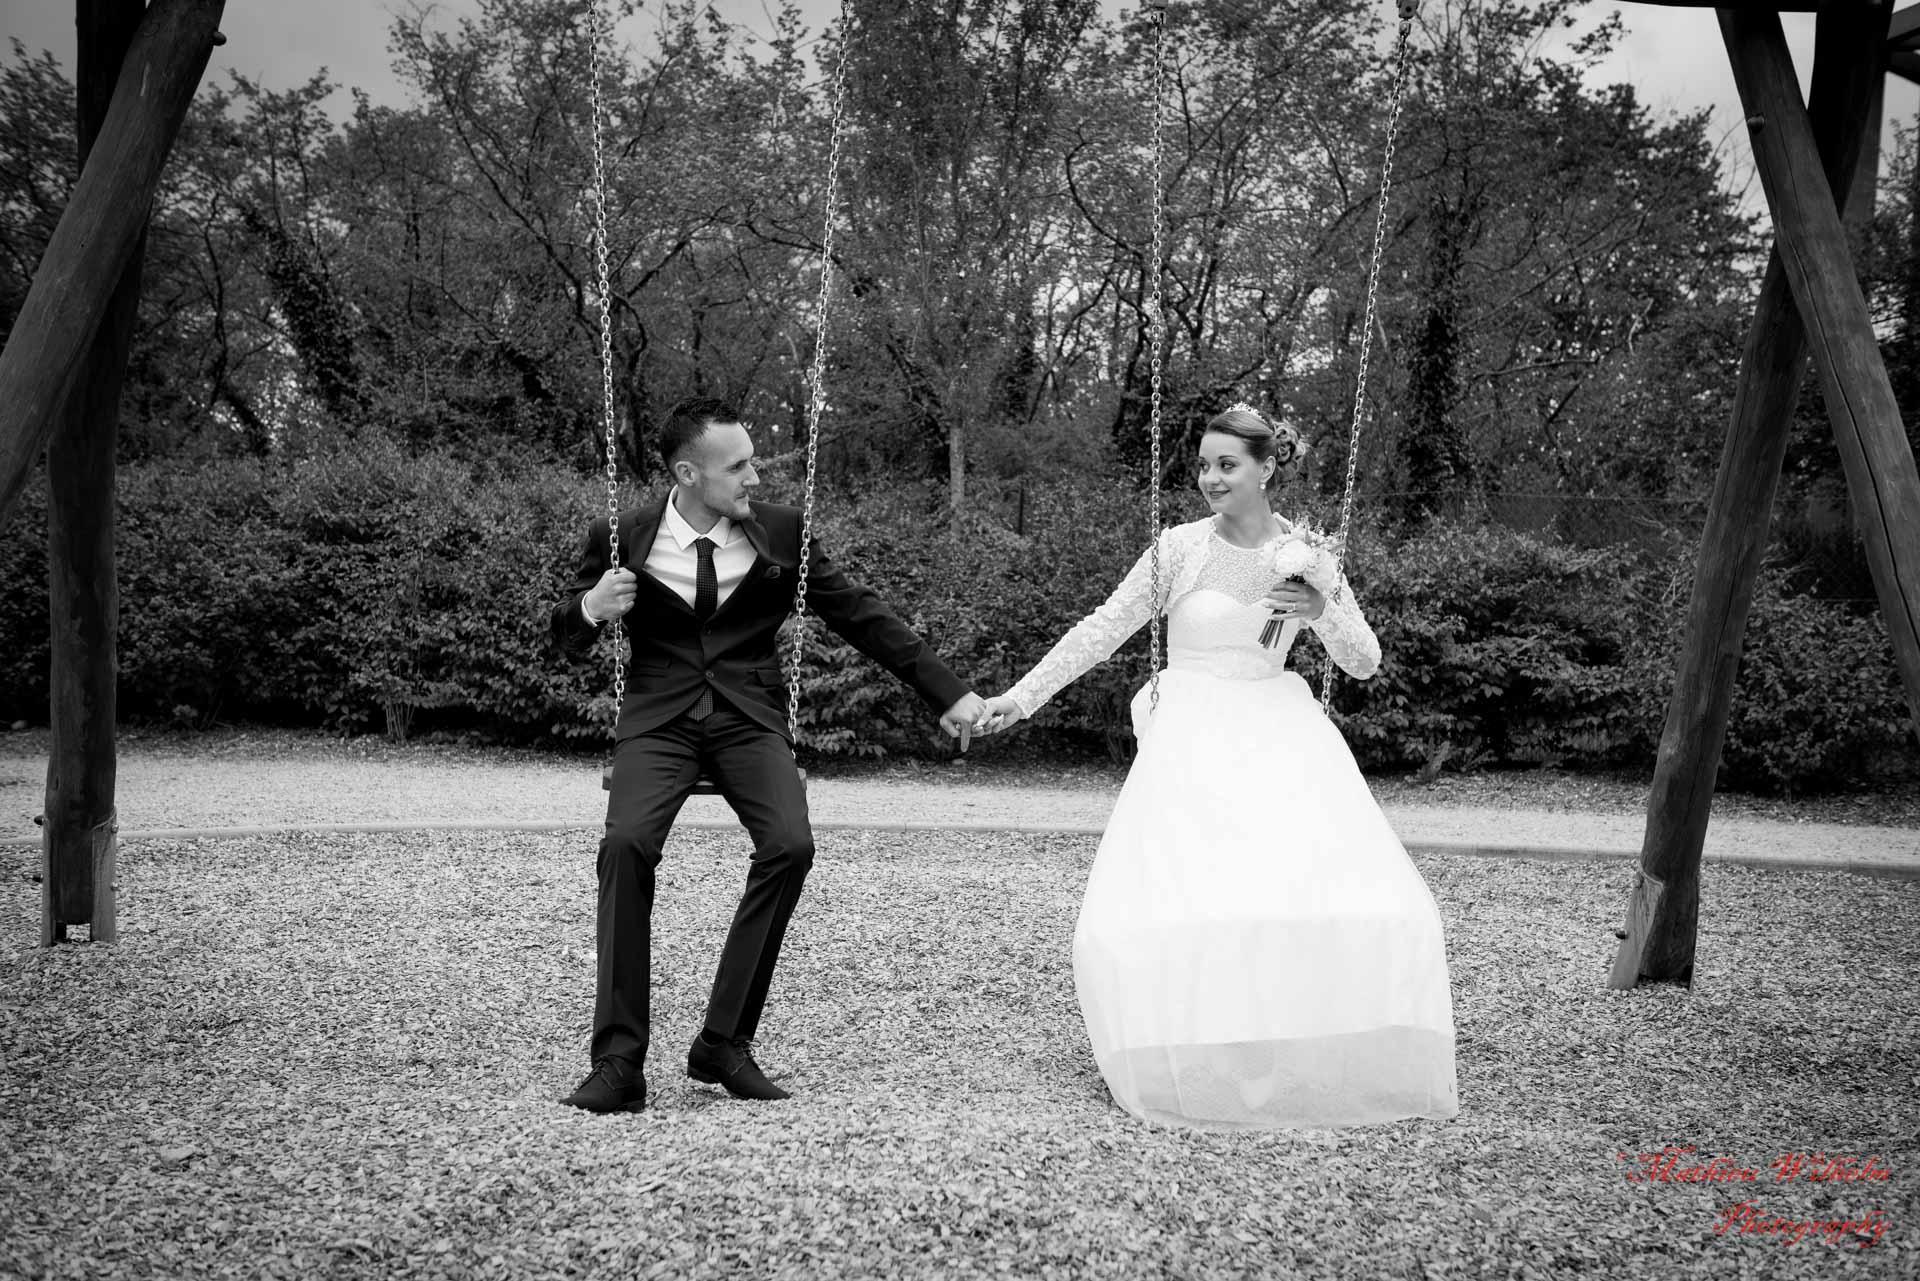 2017-04-15 Adeline Braghiroli - Florian - mariage (314)